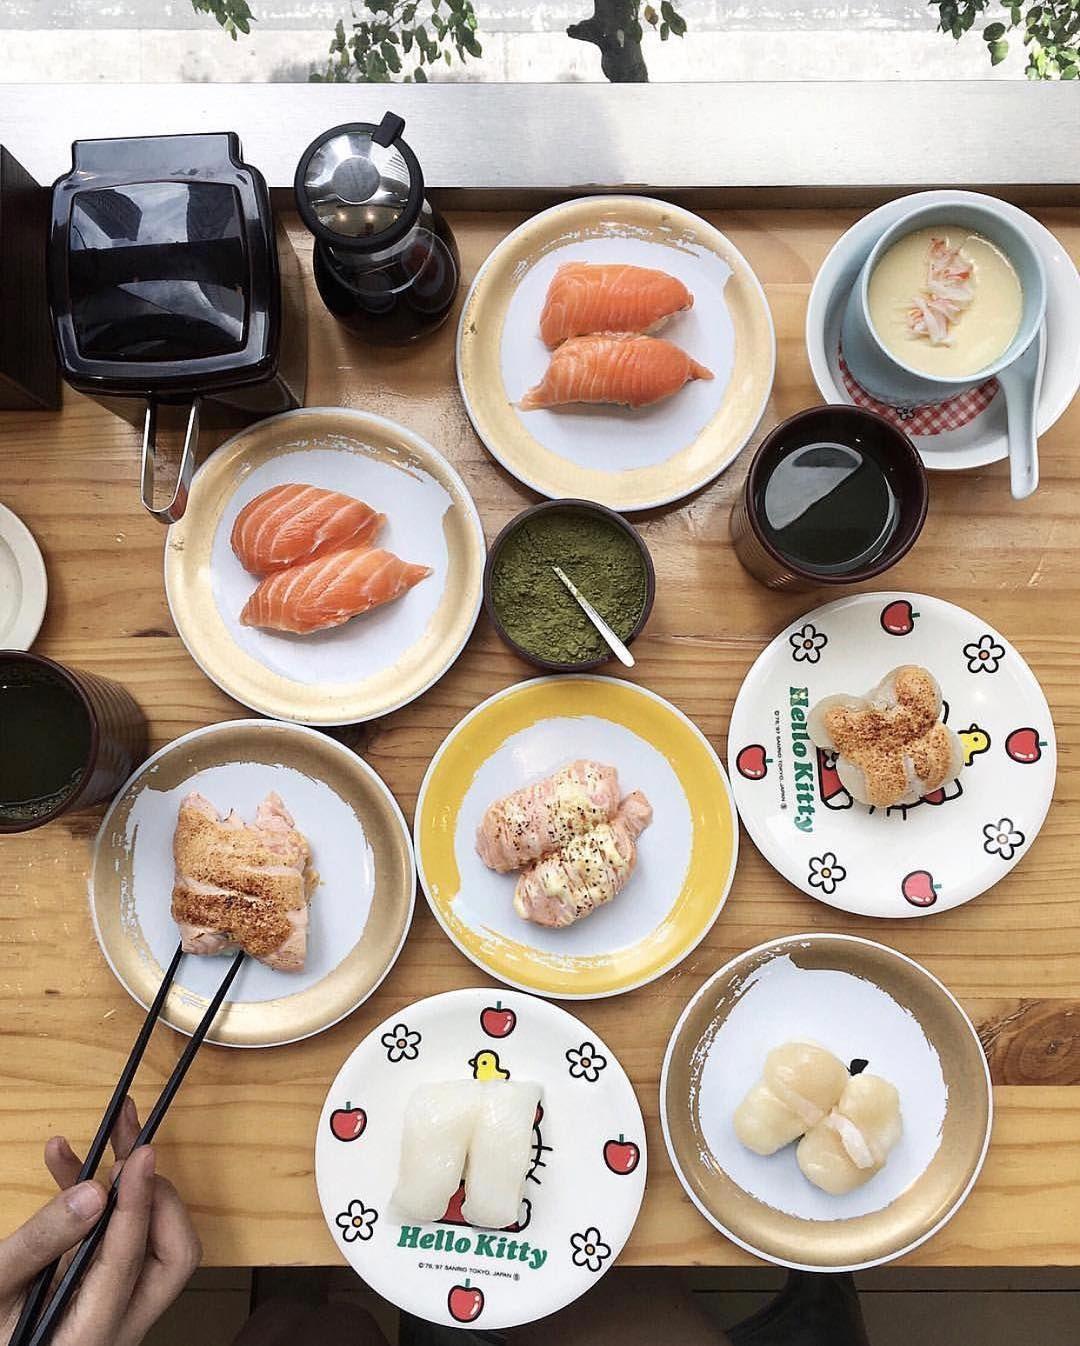 Now Open Genki Sushi U P Town Center A Pioneer Of Kaiten Or Maki Ramen Tempura And More Served On Revolving Conveyor Belt Sd Trains